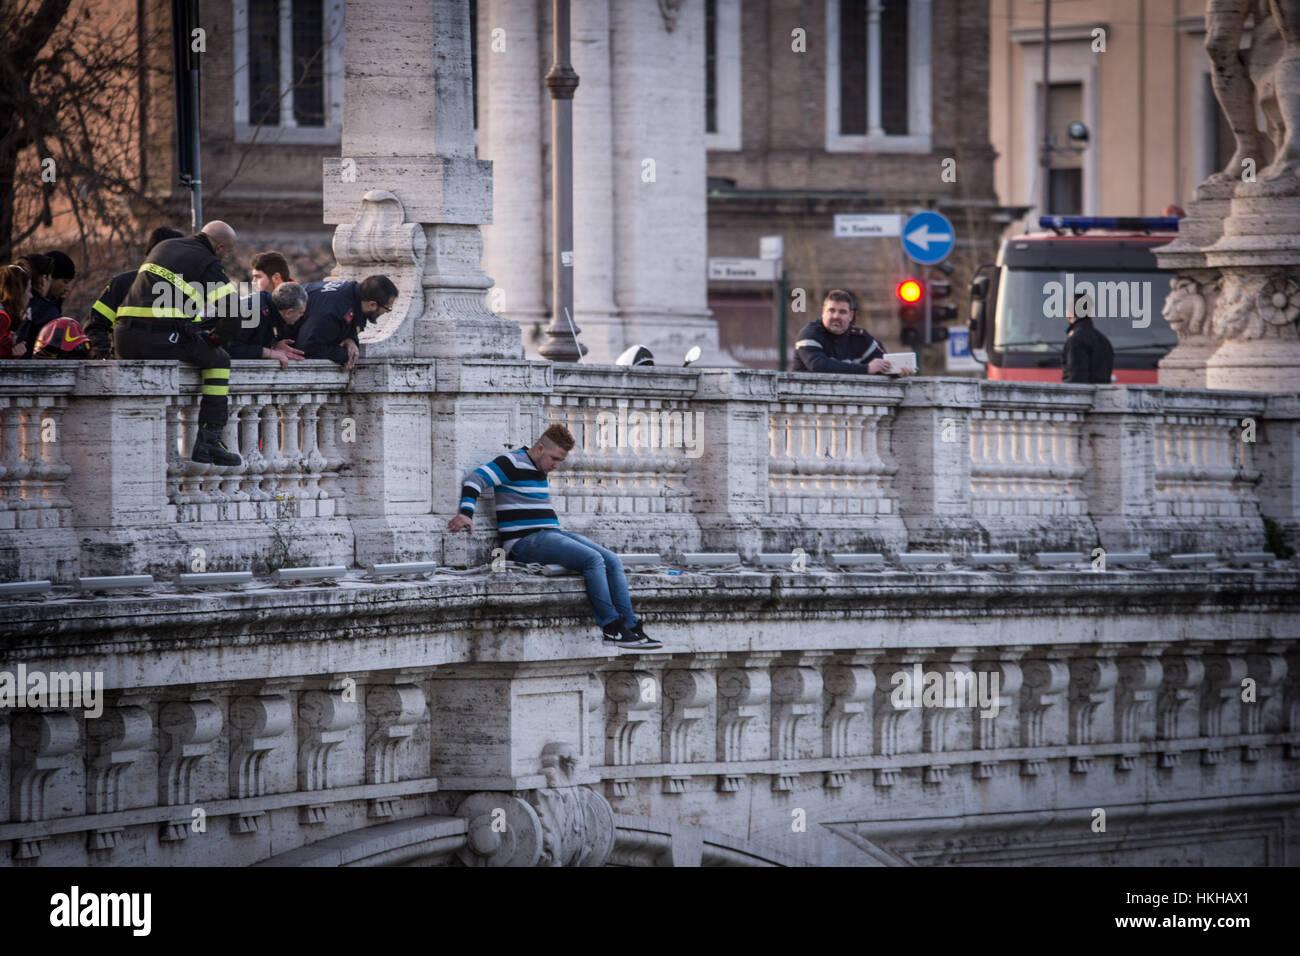 Rom Italien 27 Januar 2017 Selbstmordversuch Von Brücke Vittorio